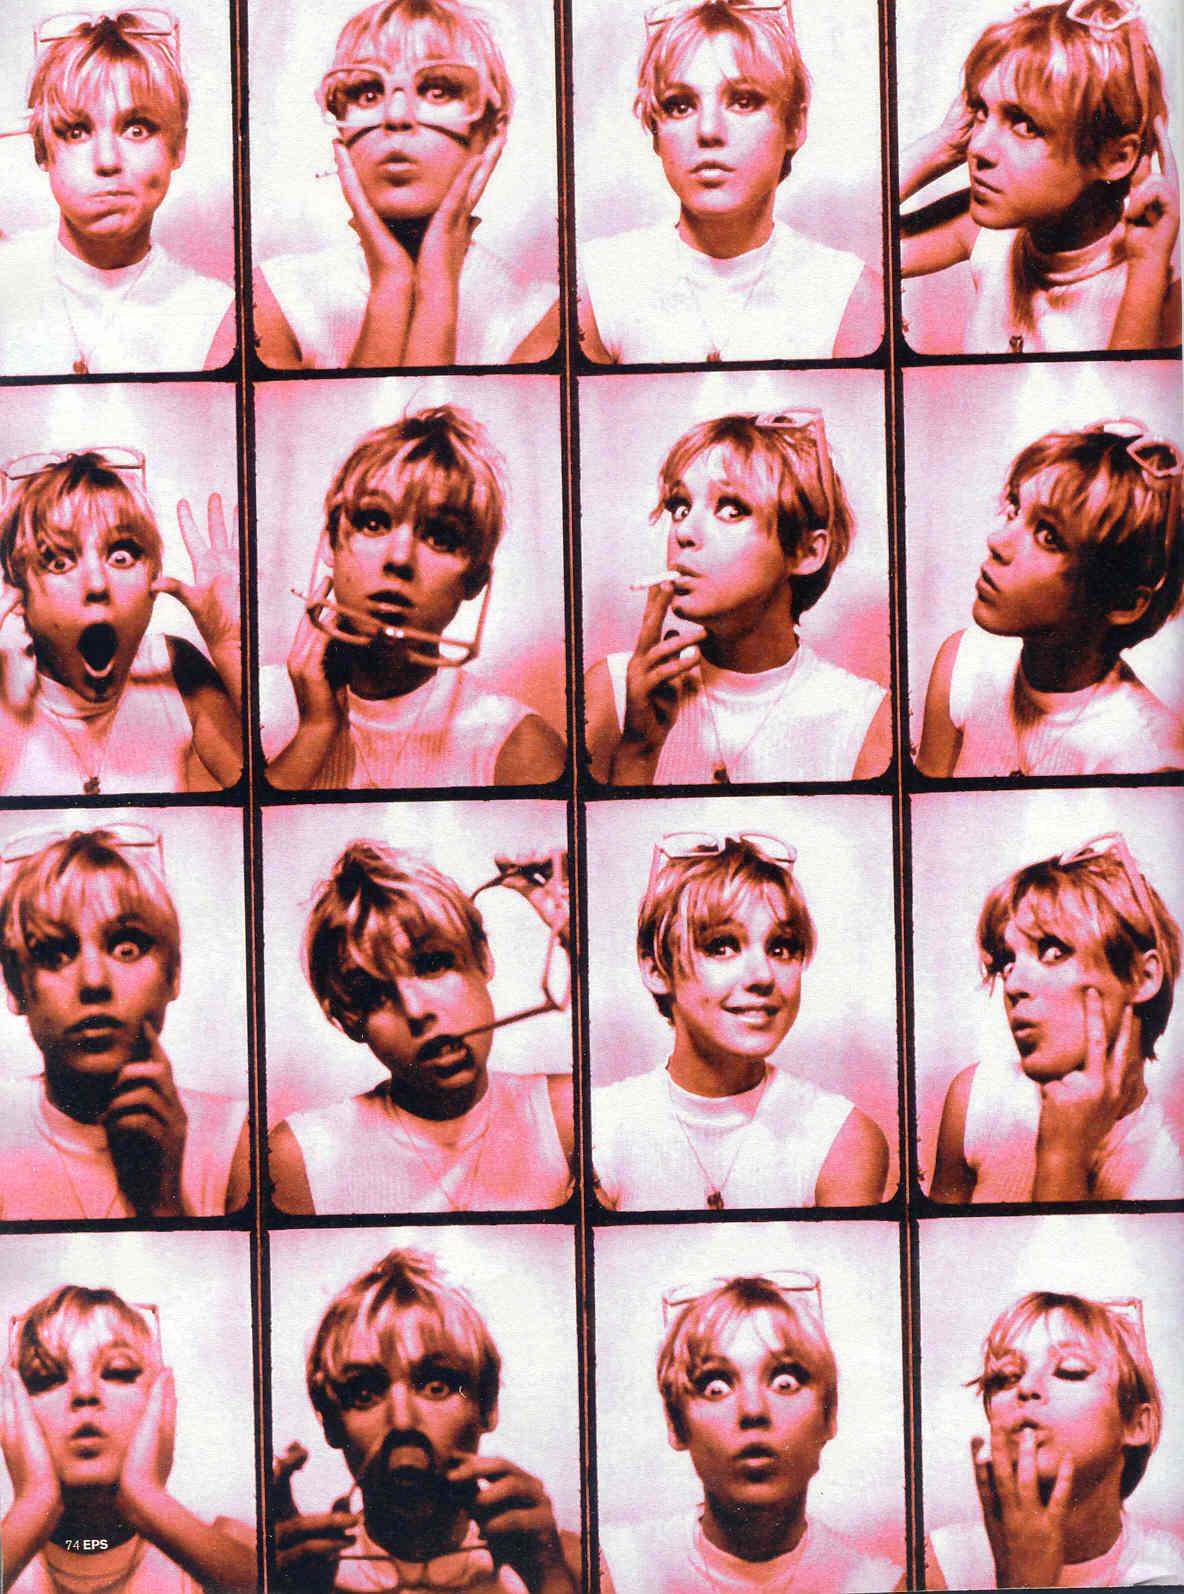 Edie Sedgwick S Photos By Andy Warhol Vintage Everyday